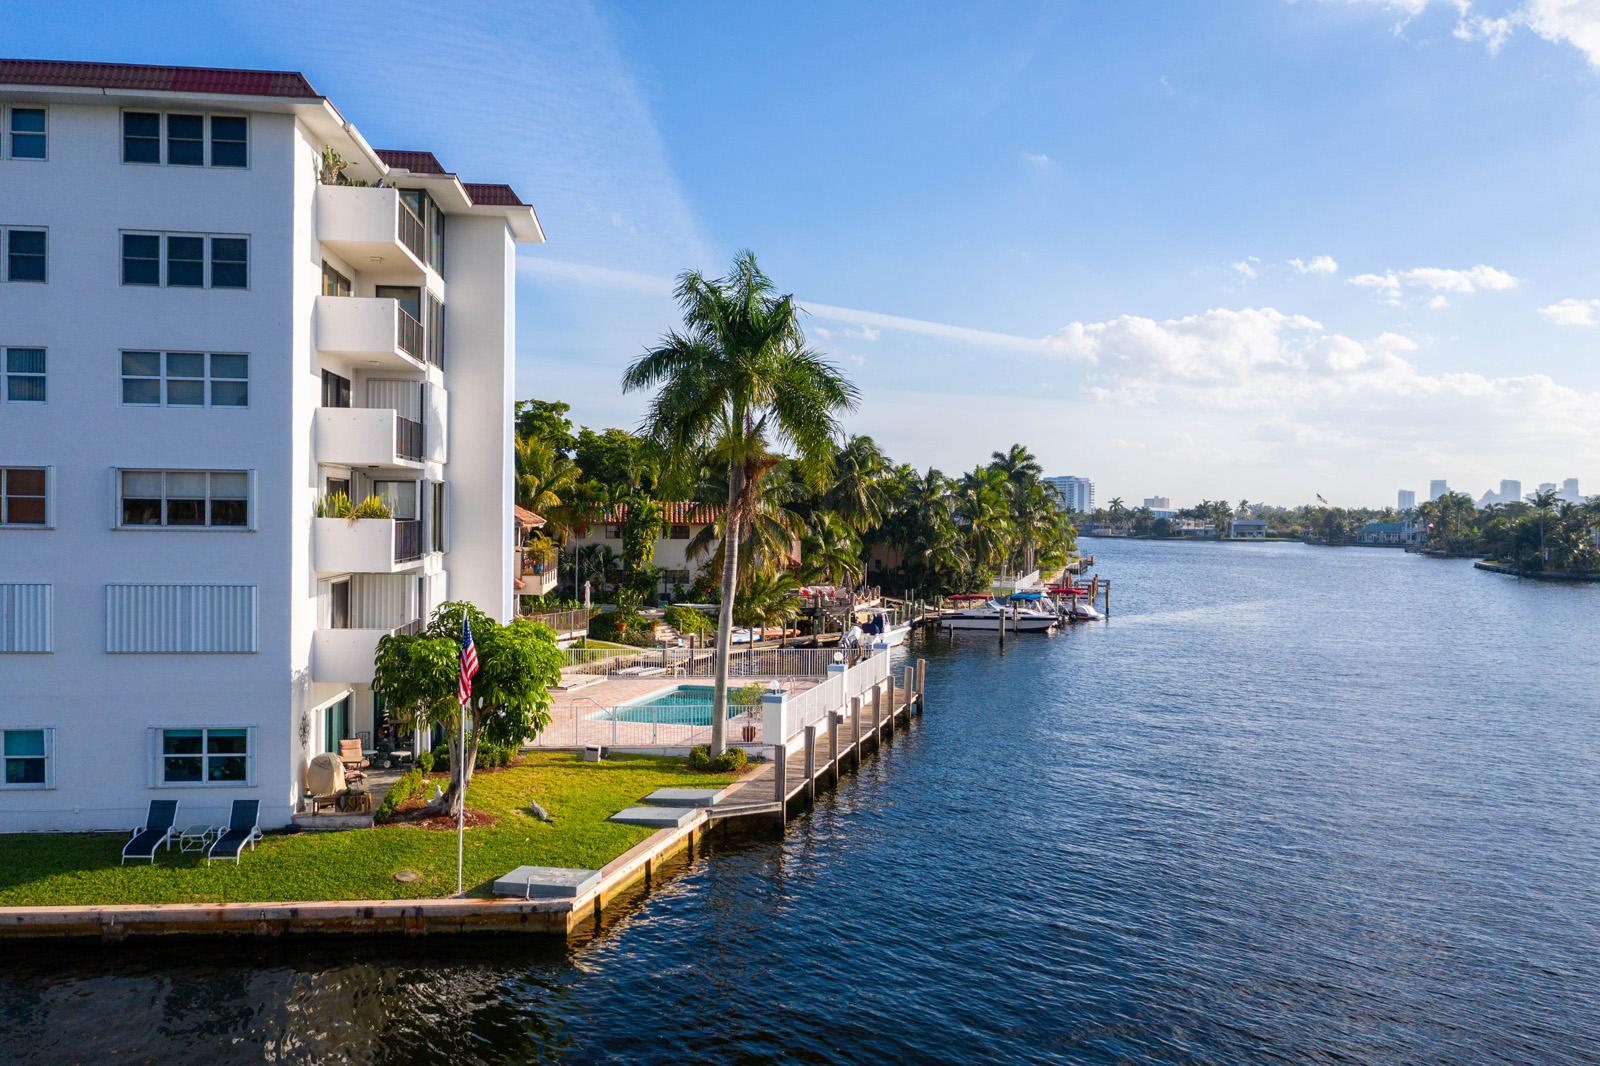 Rivers Bend, 1839 Middle River Unit 404, Fort Lauderdale, Florida 33305